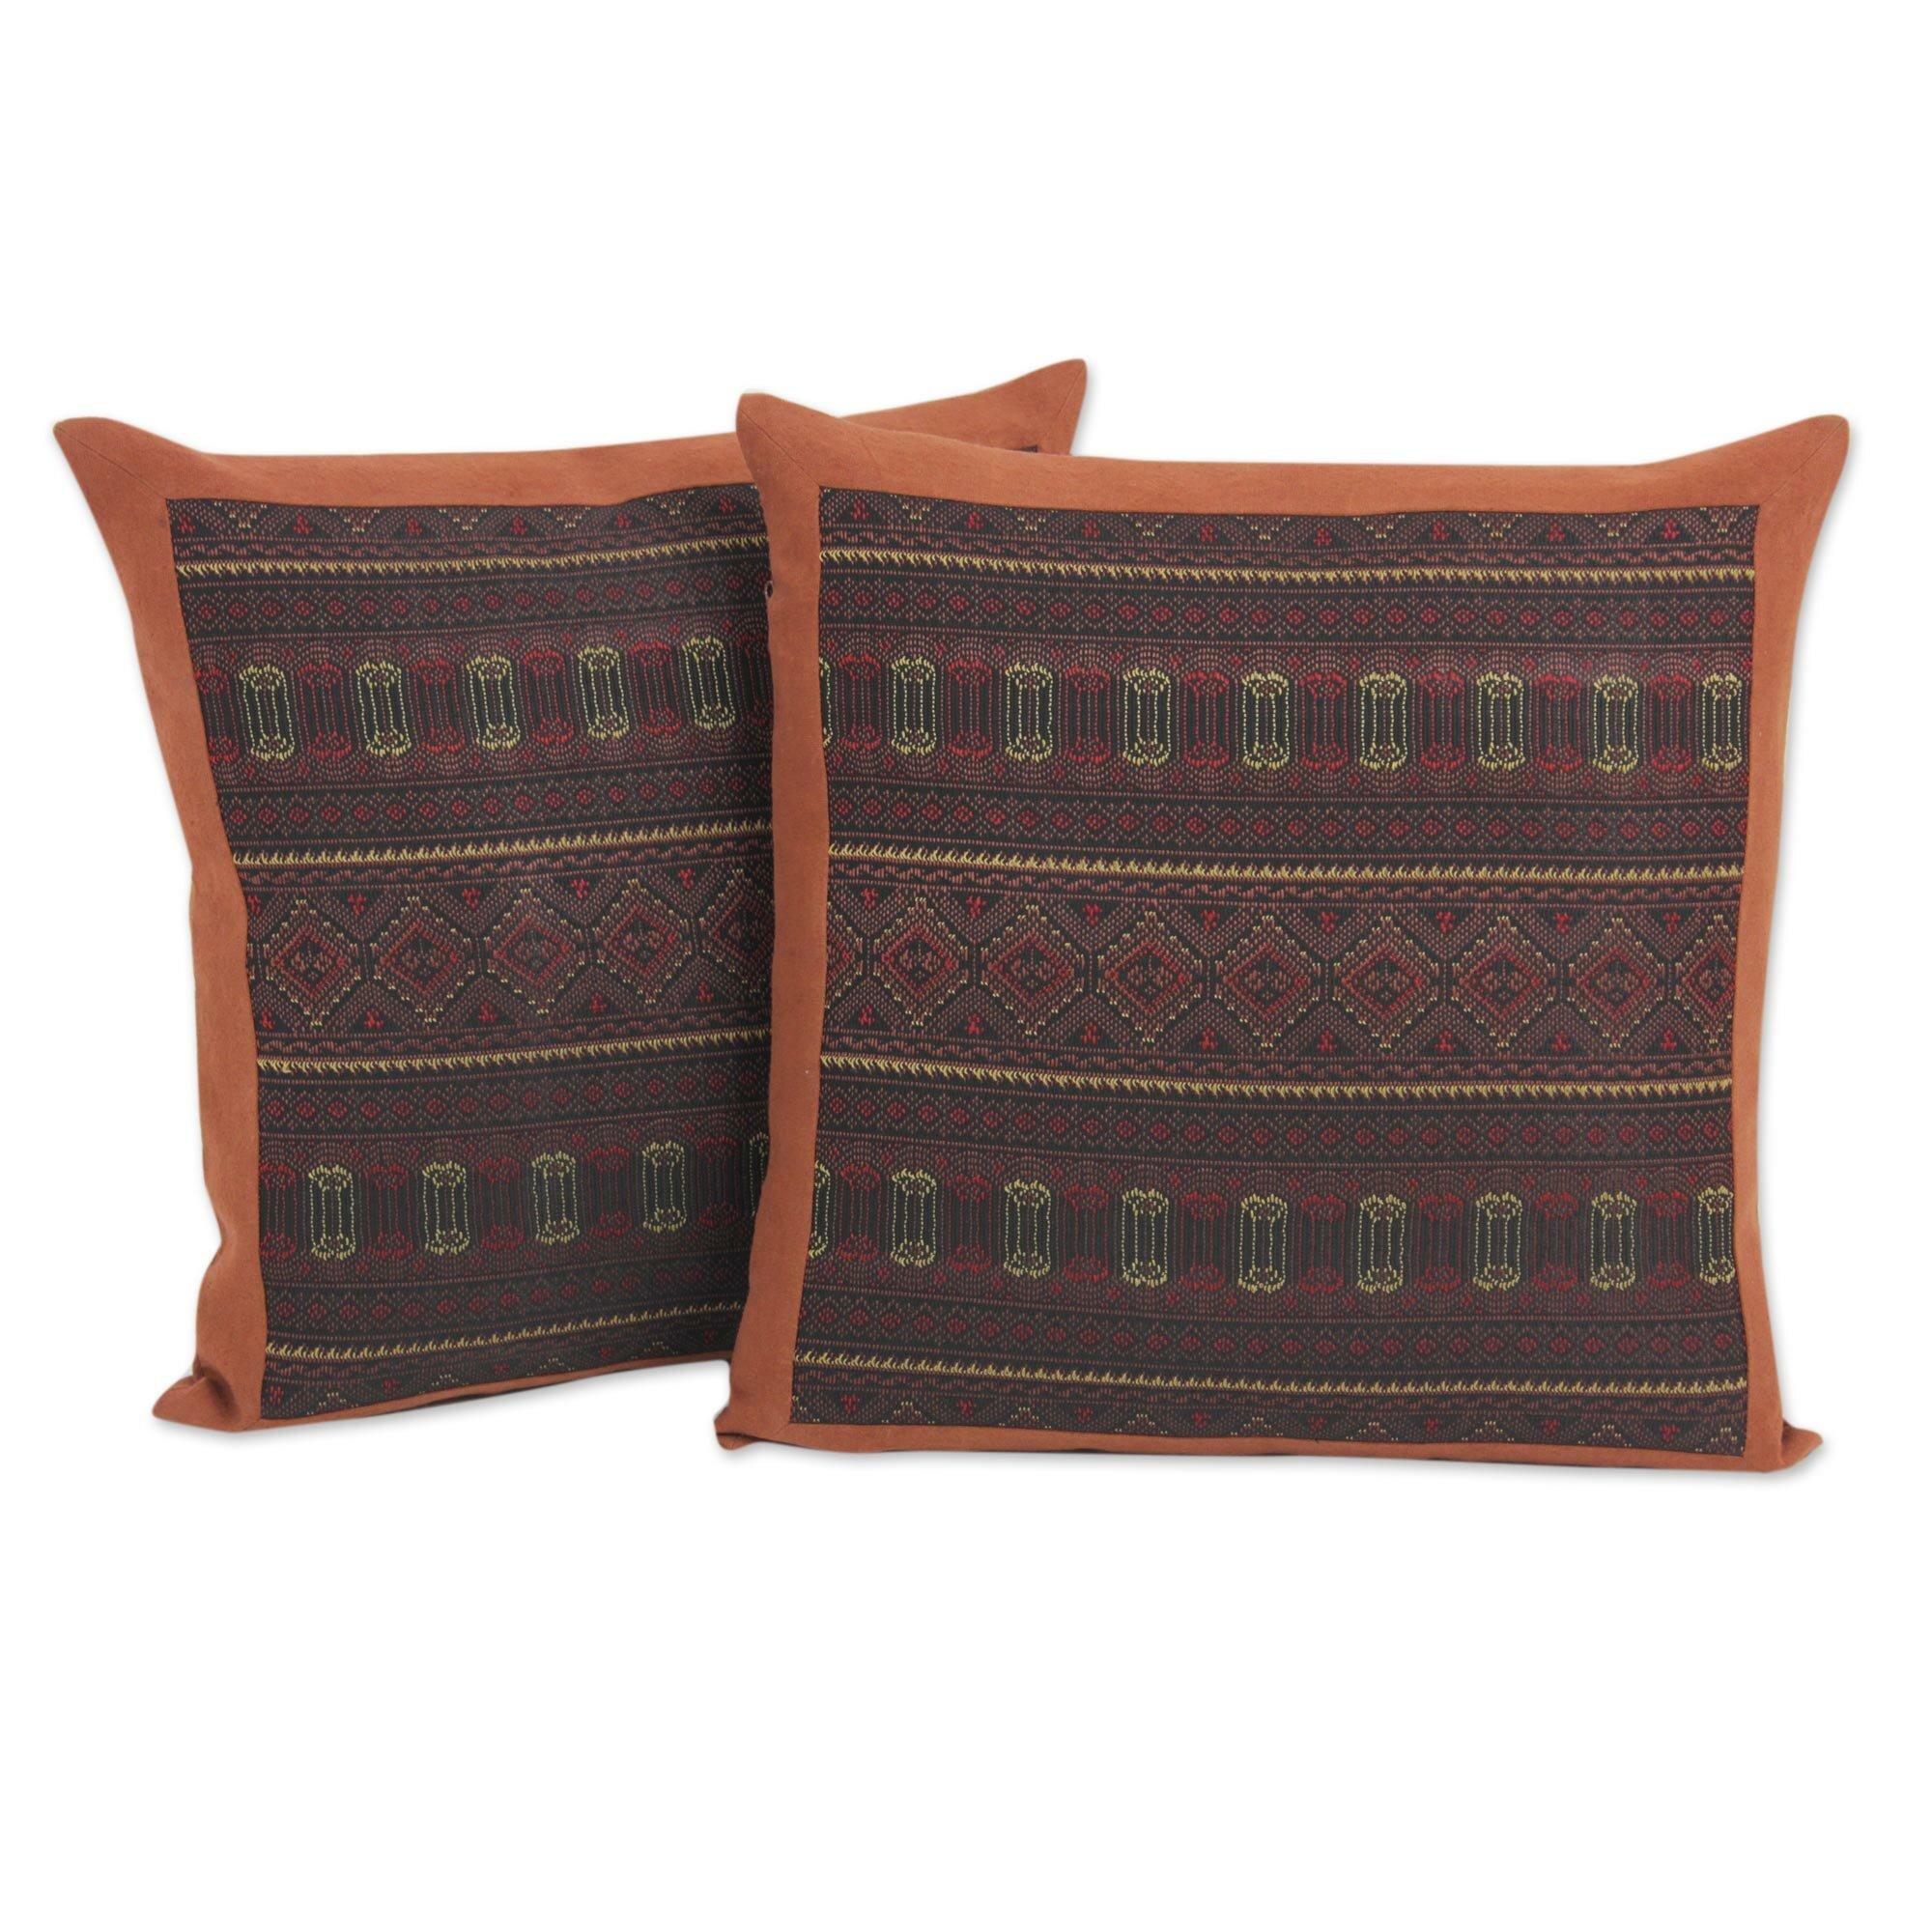 Throw Pillow Covers Cotton : Novica Keawpankanlaya Embroidery Cotton Throw Pillow Cover Wayfair